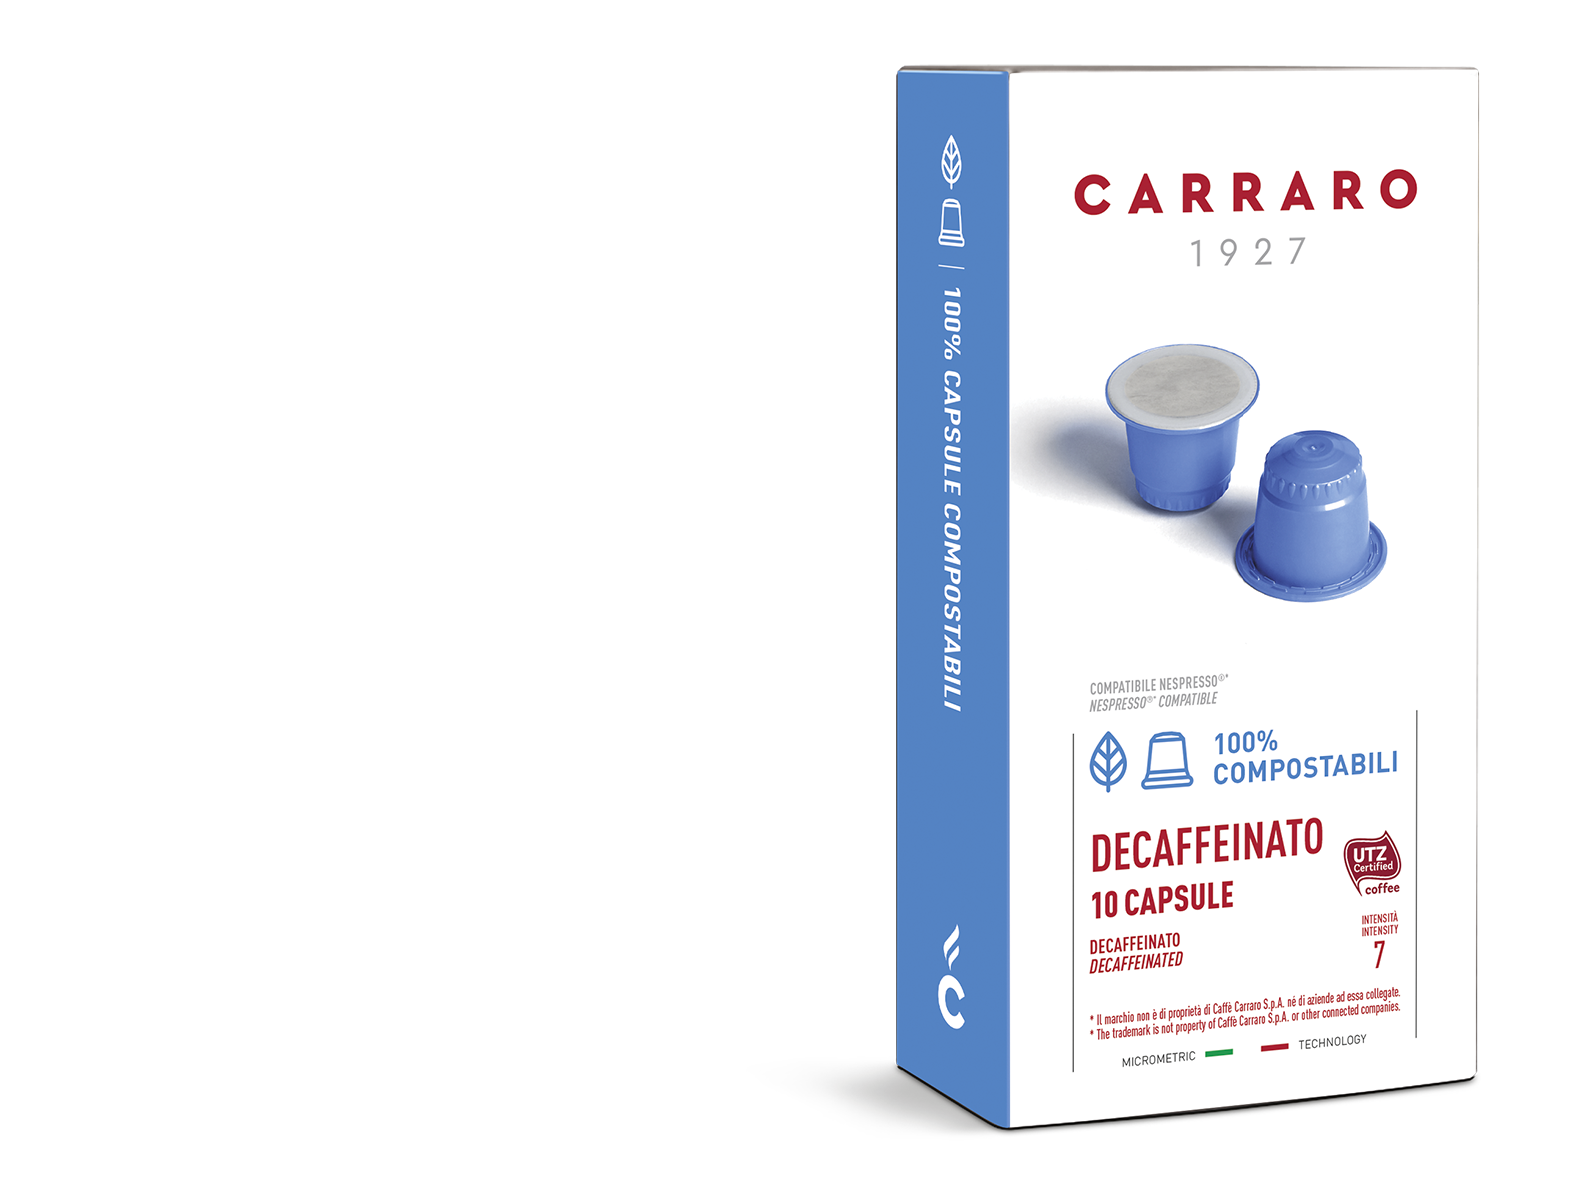 Decaffeinato – 10 compostable capsules